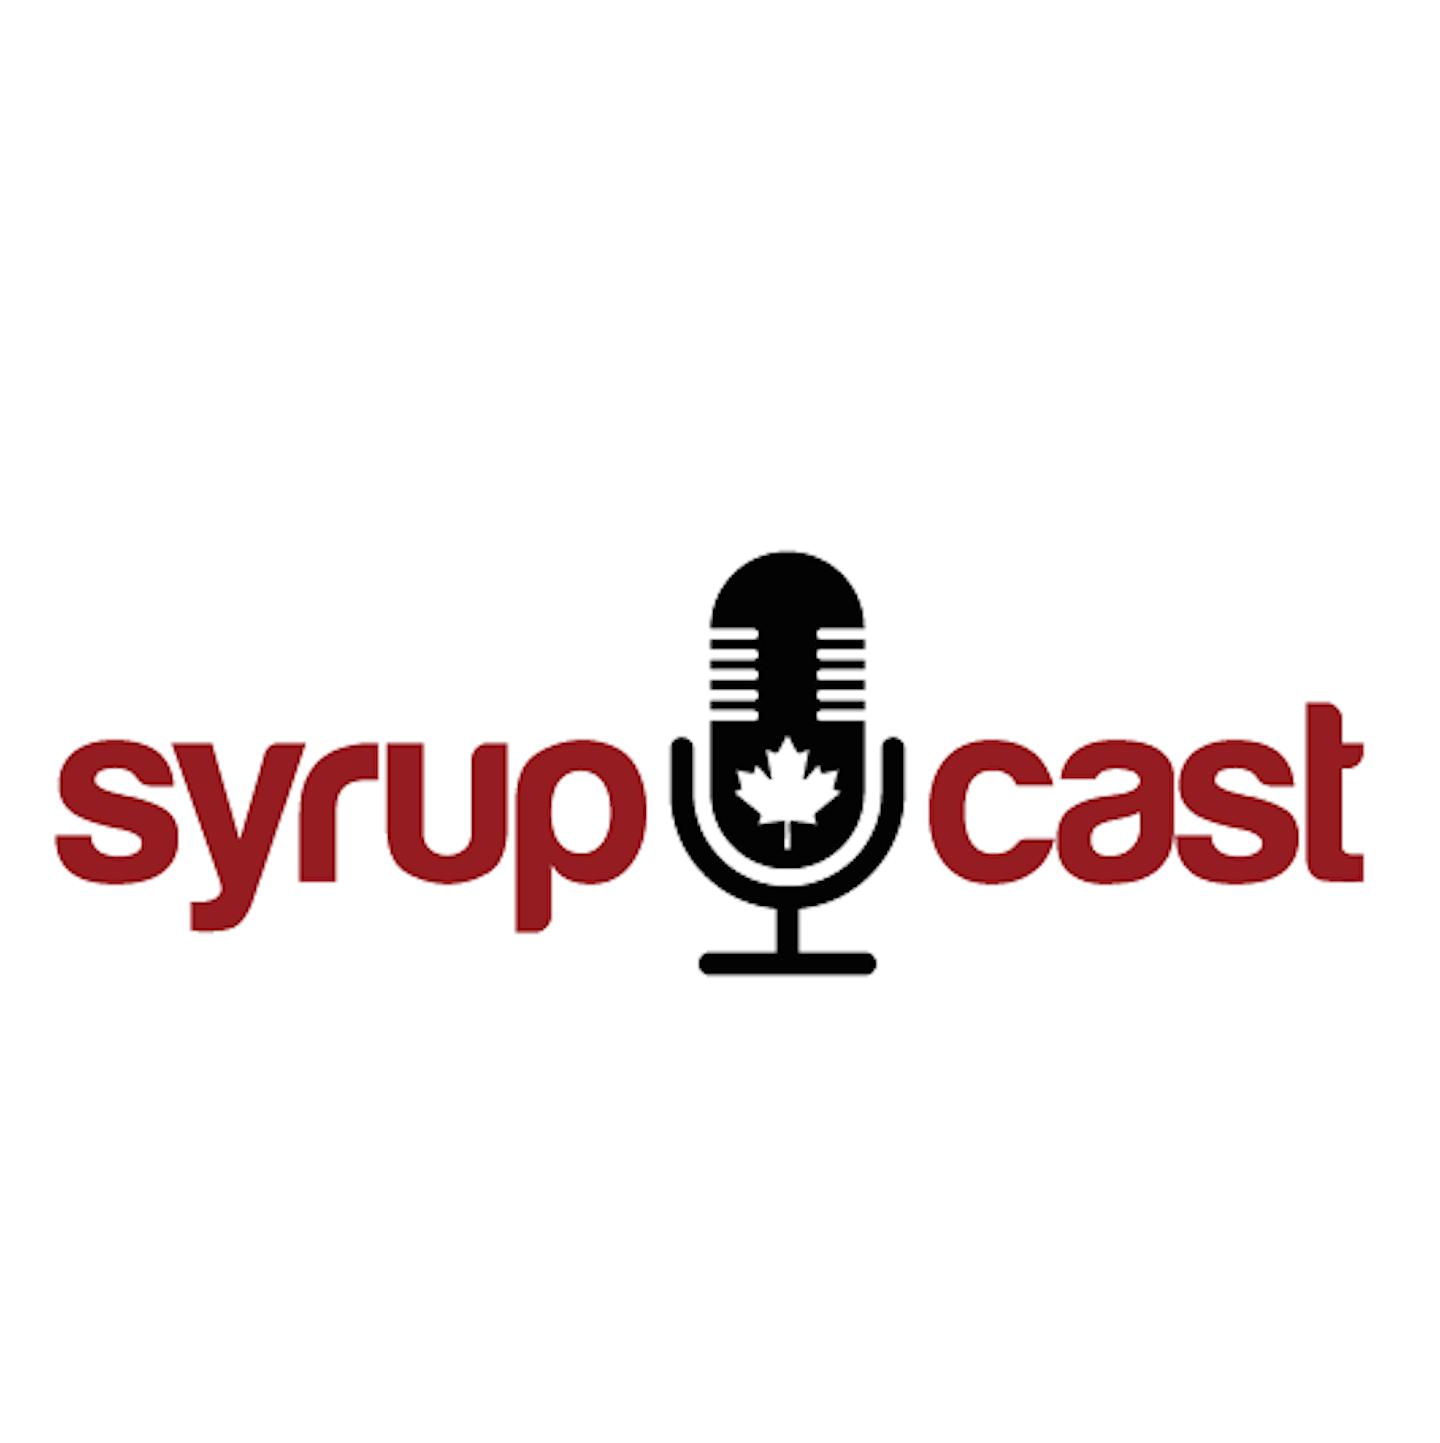 SyrupCast